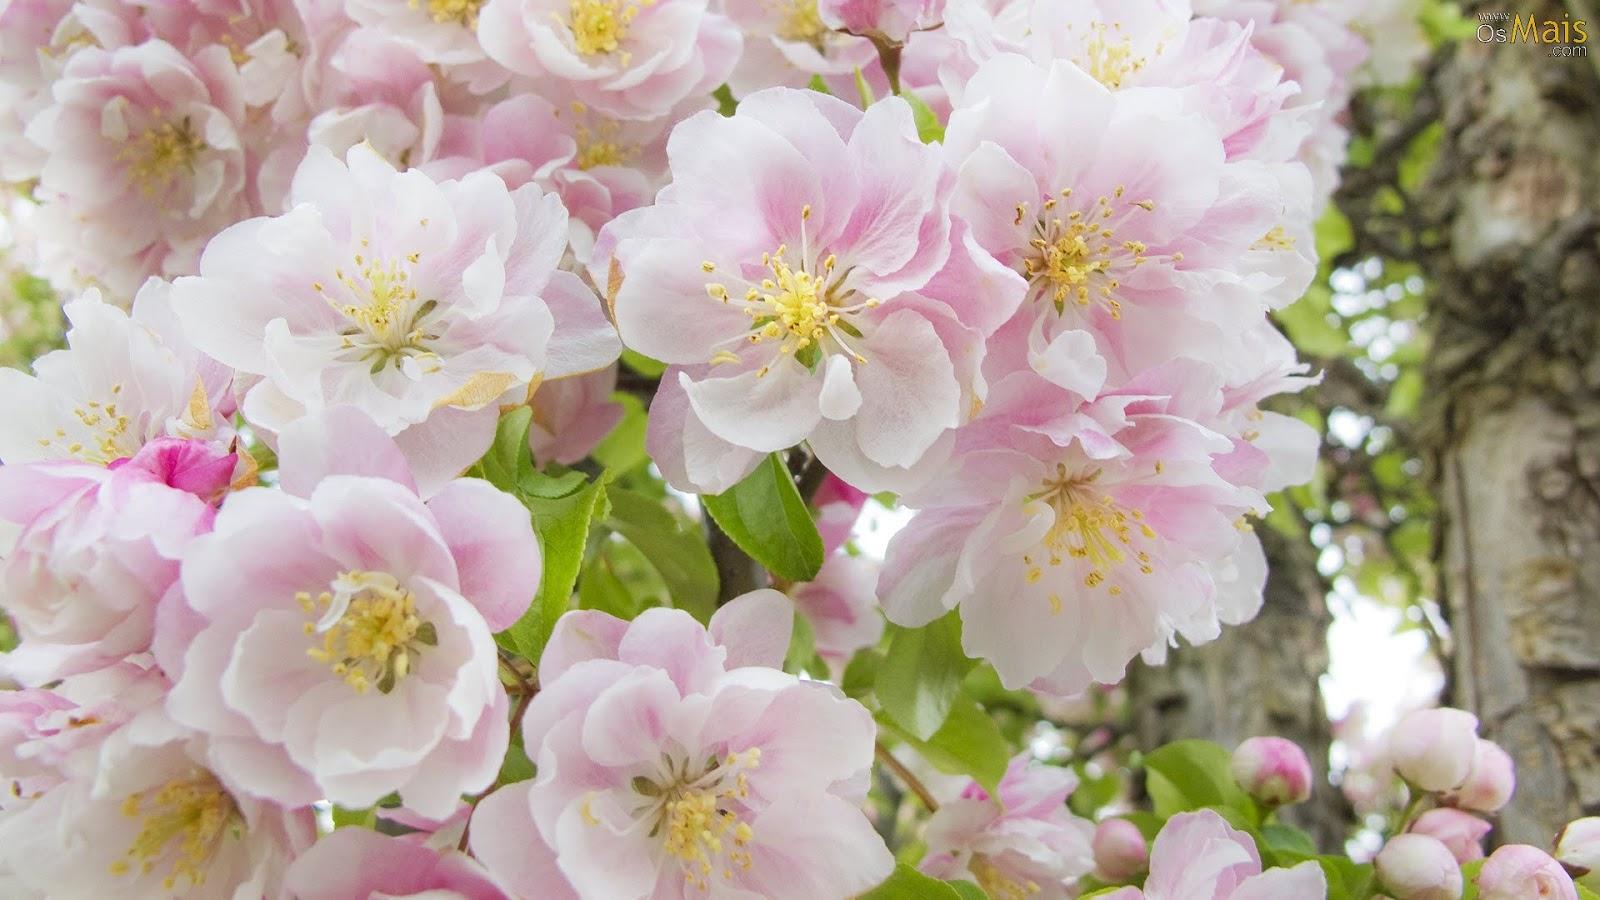 Wallpapernarium lindo ramo de flores rosadas - Ramos de flores hermosas ...